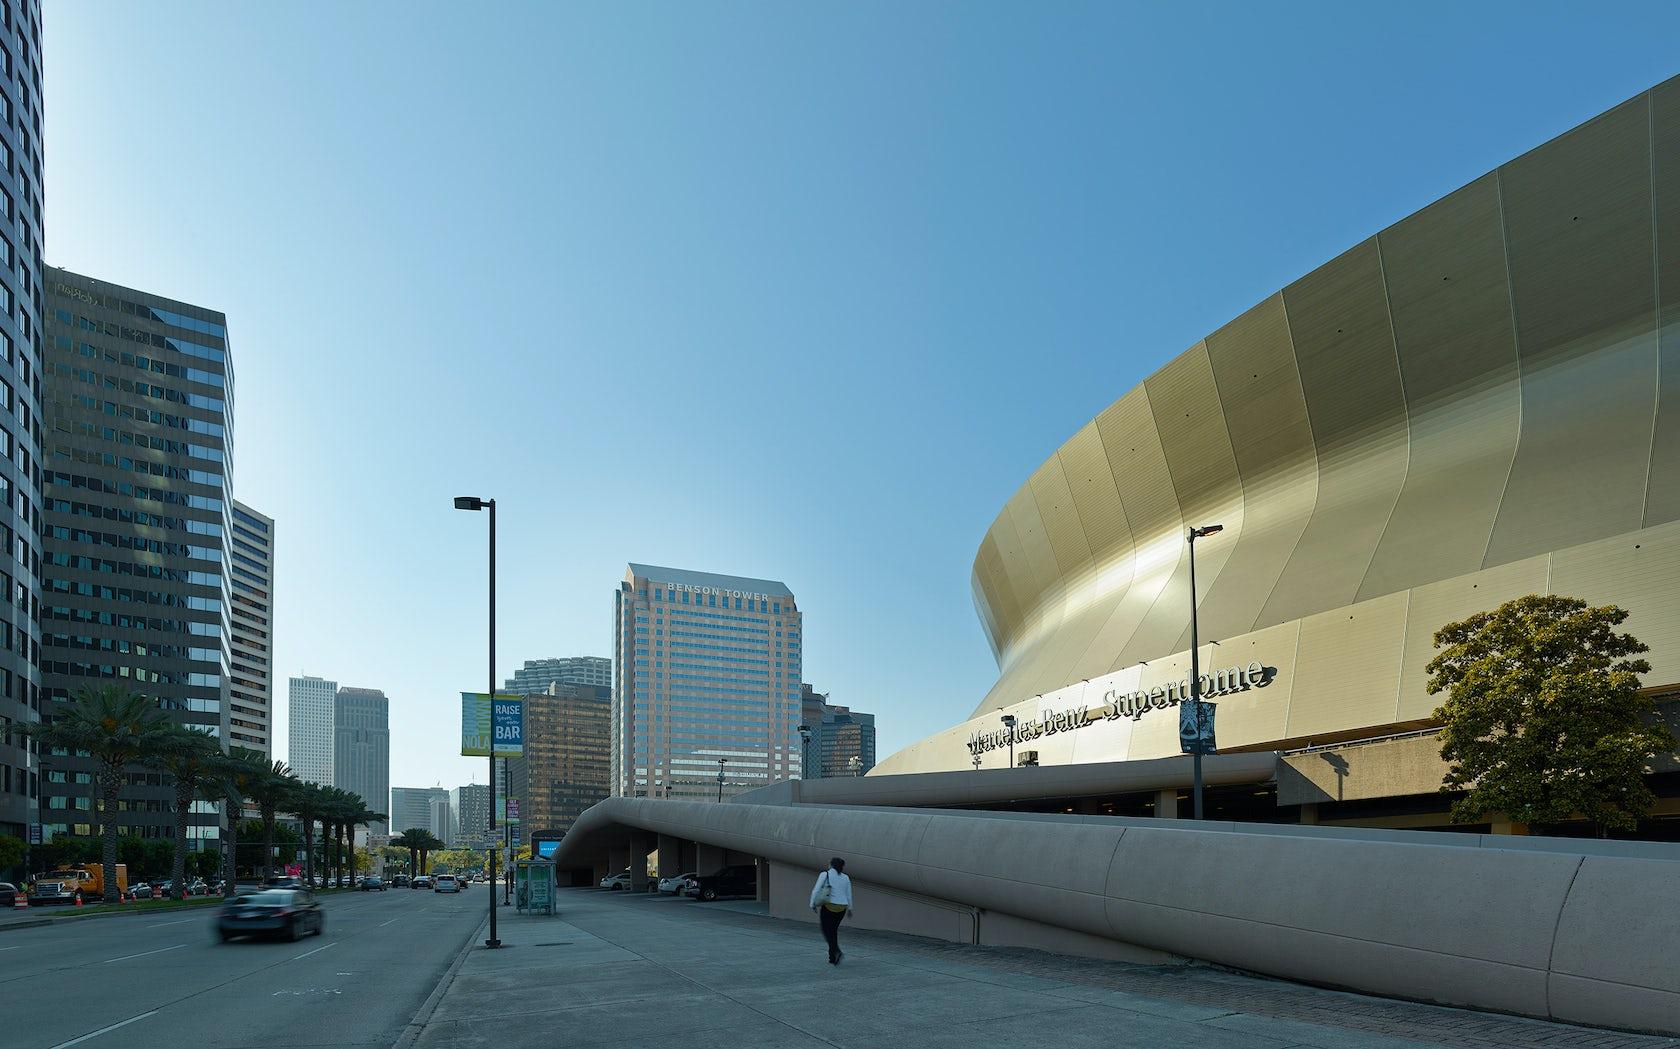 Mercedes benz superdome renovation architizer for Hotels near mercedes benz stadium new orleans